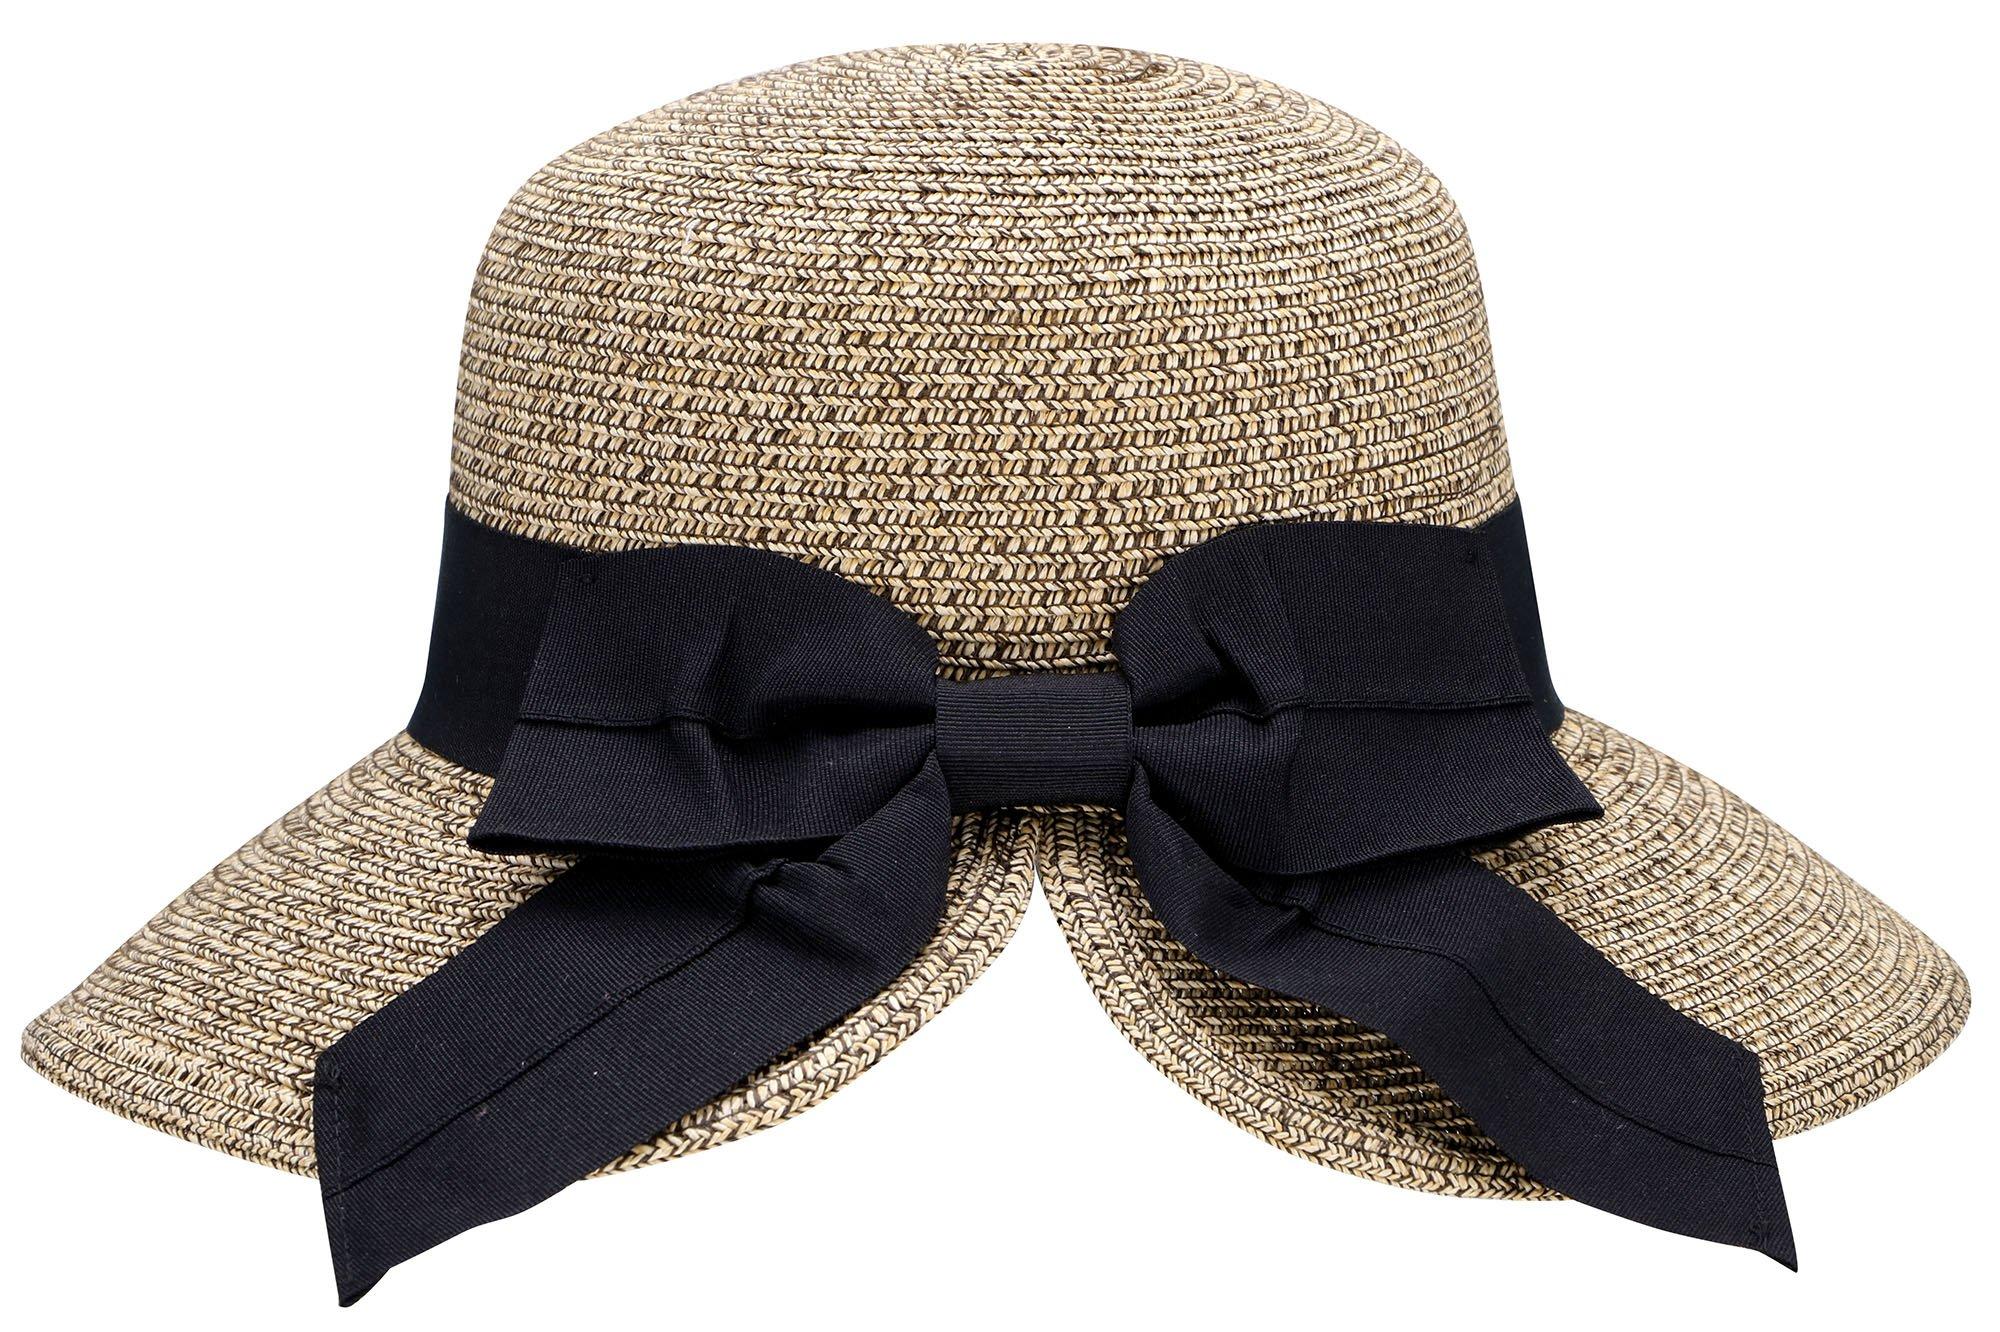 AbbyLexi Women's Vintage Roll Up Sun Visor Straw Hat w/Bow, Beige Da Coffee